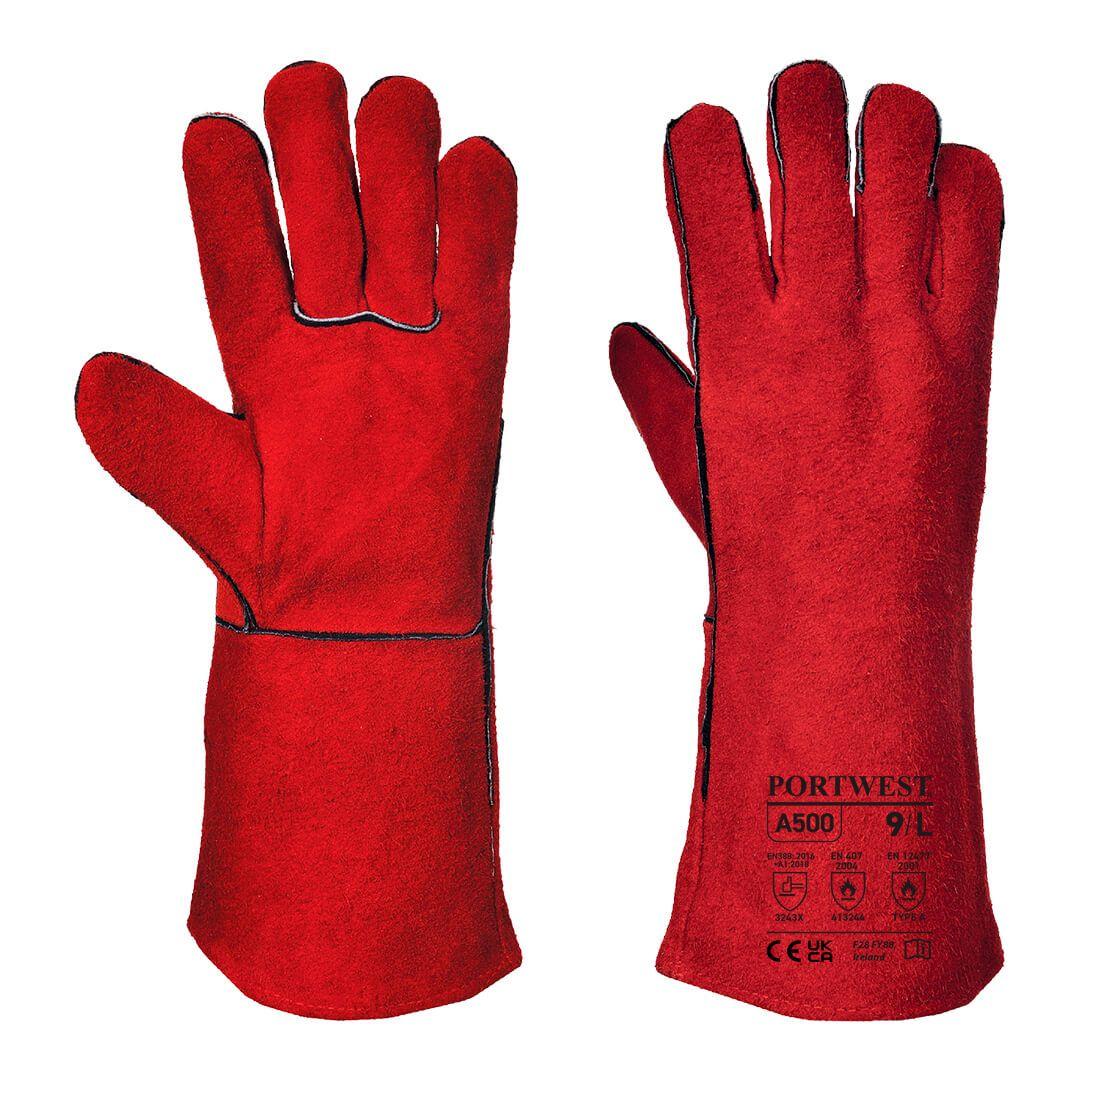 Portwest Handschoenen A500 rood(RE)